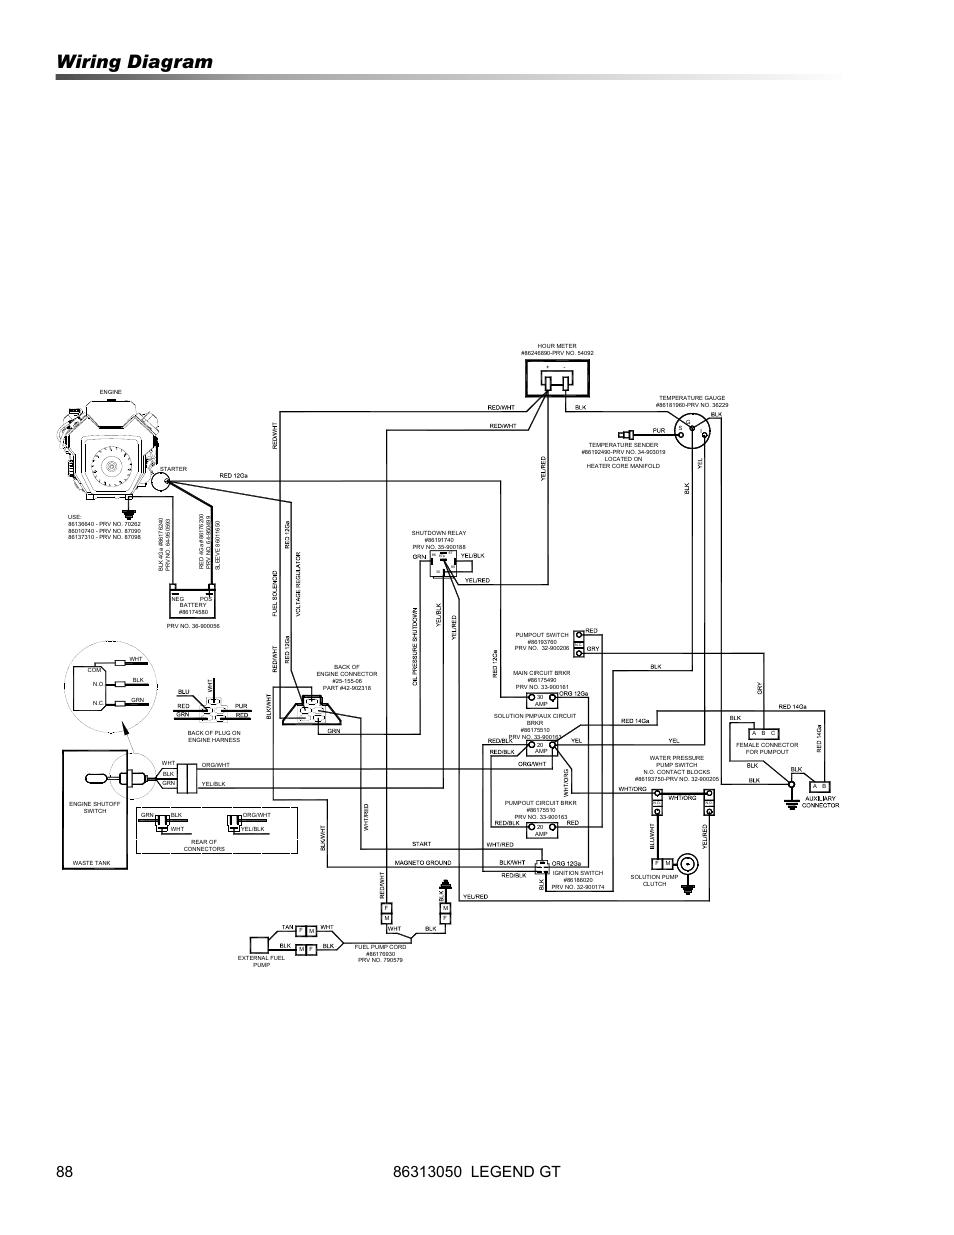 starter wiring diagram for 72 c 20